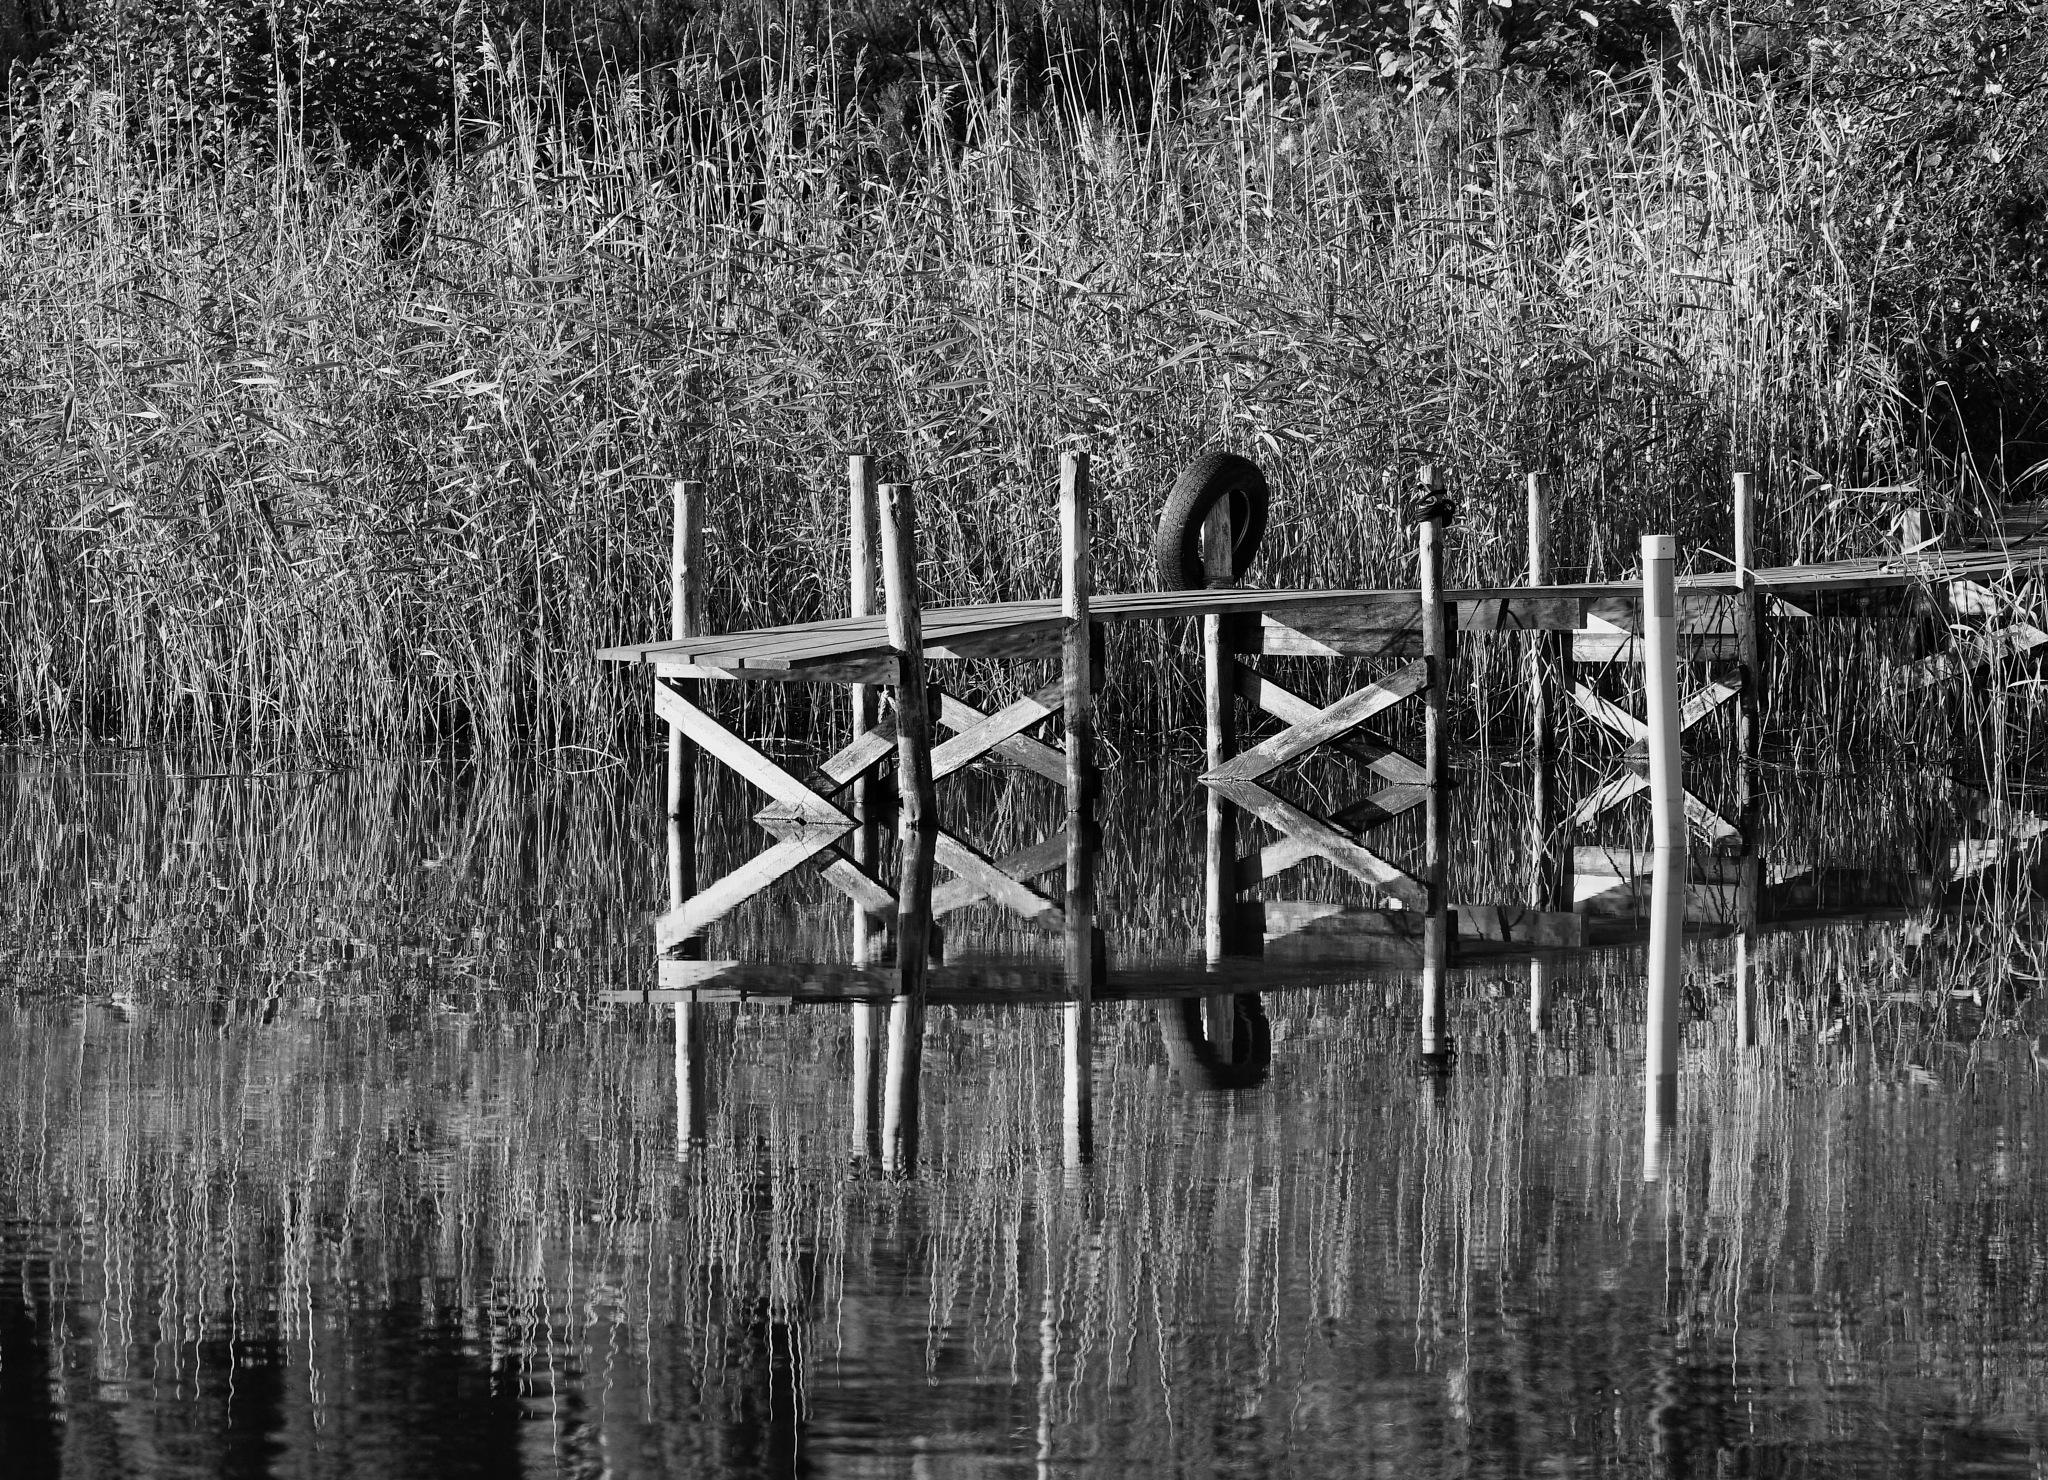 Untitled by Ove Bogart Gunnarsson